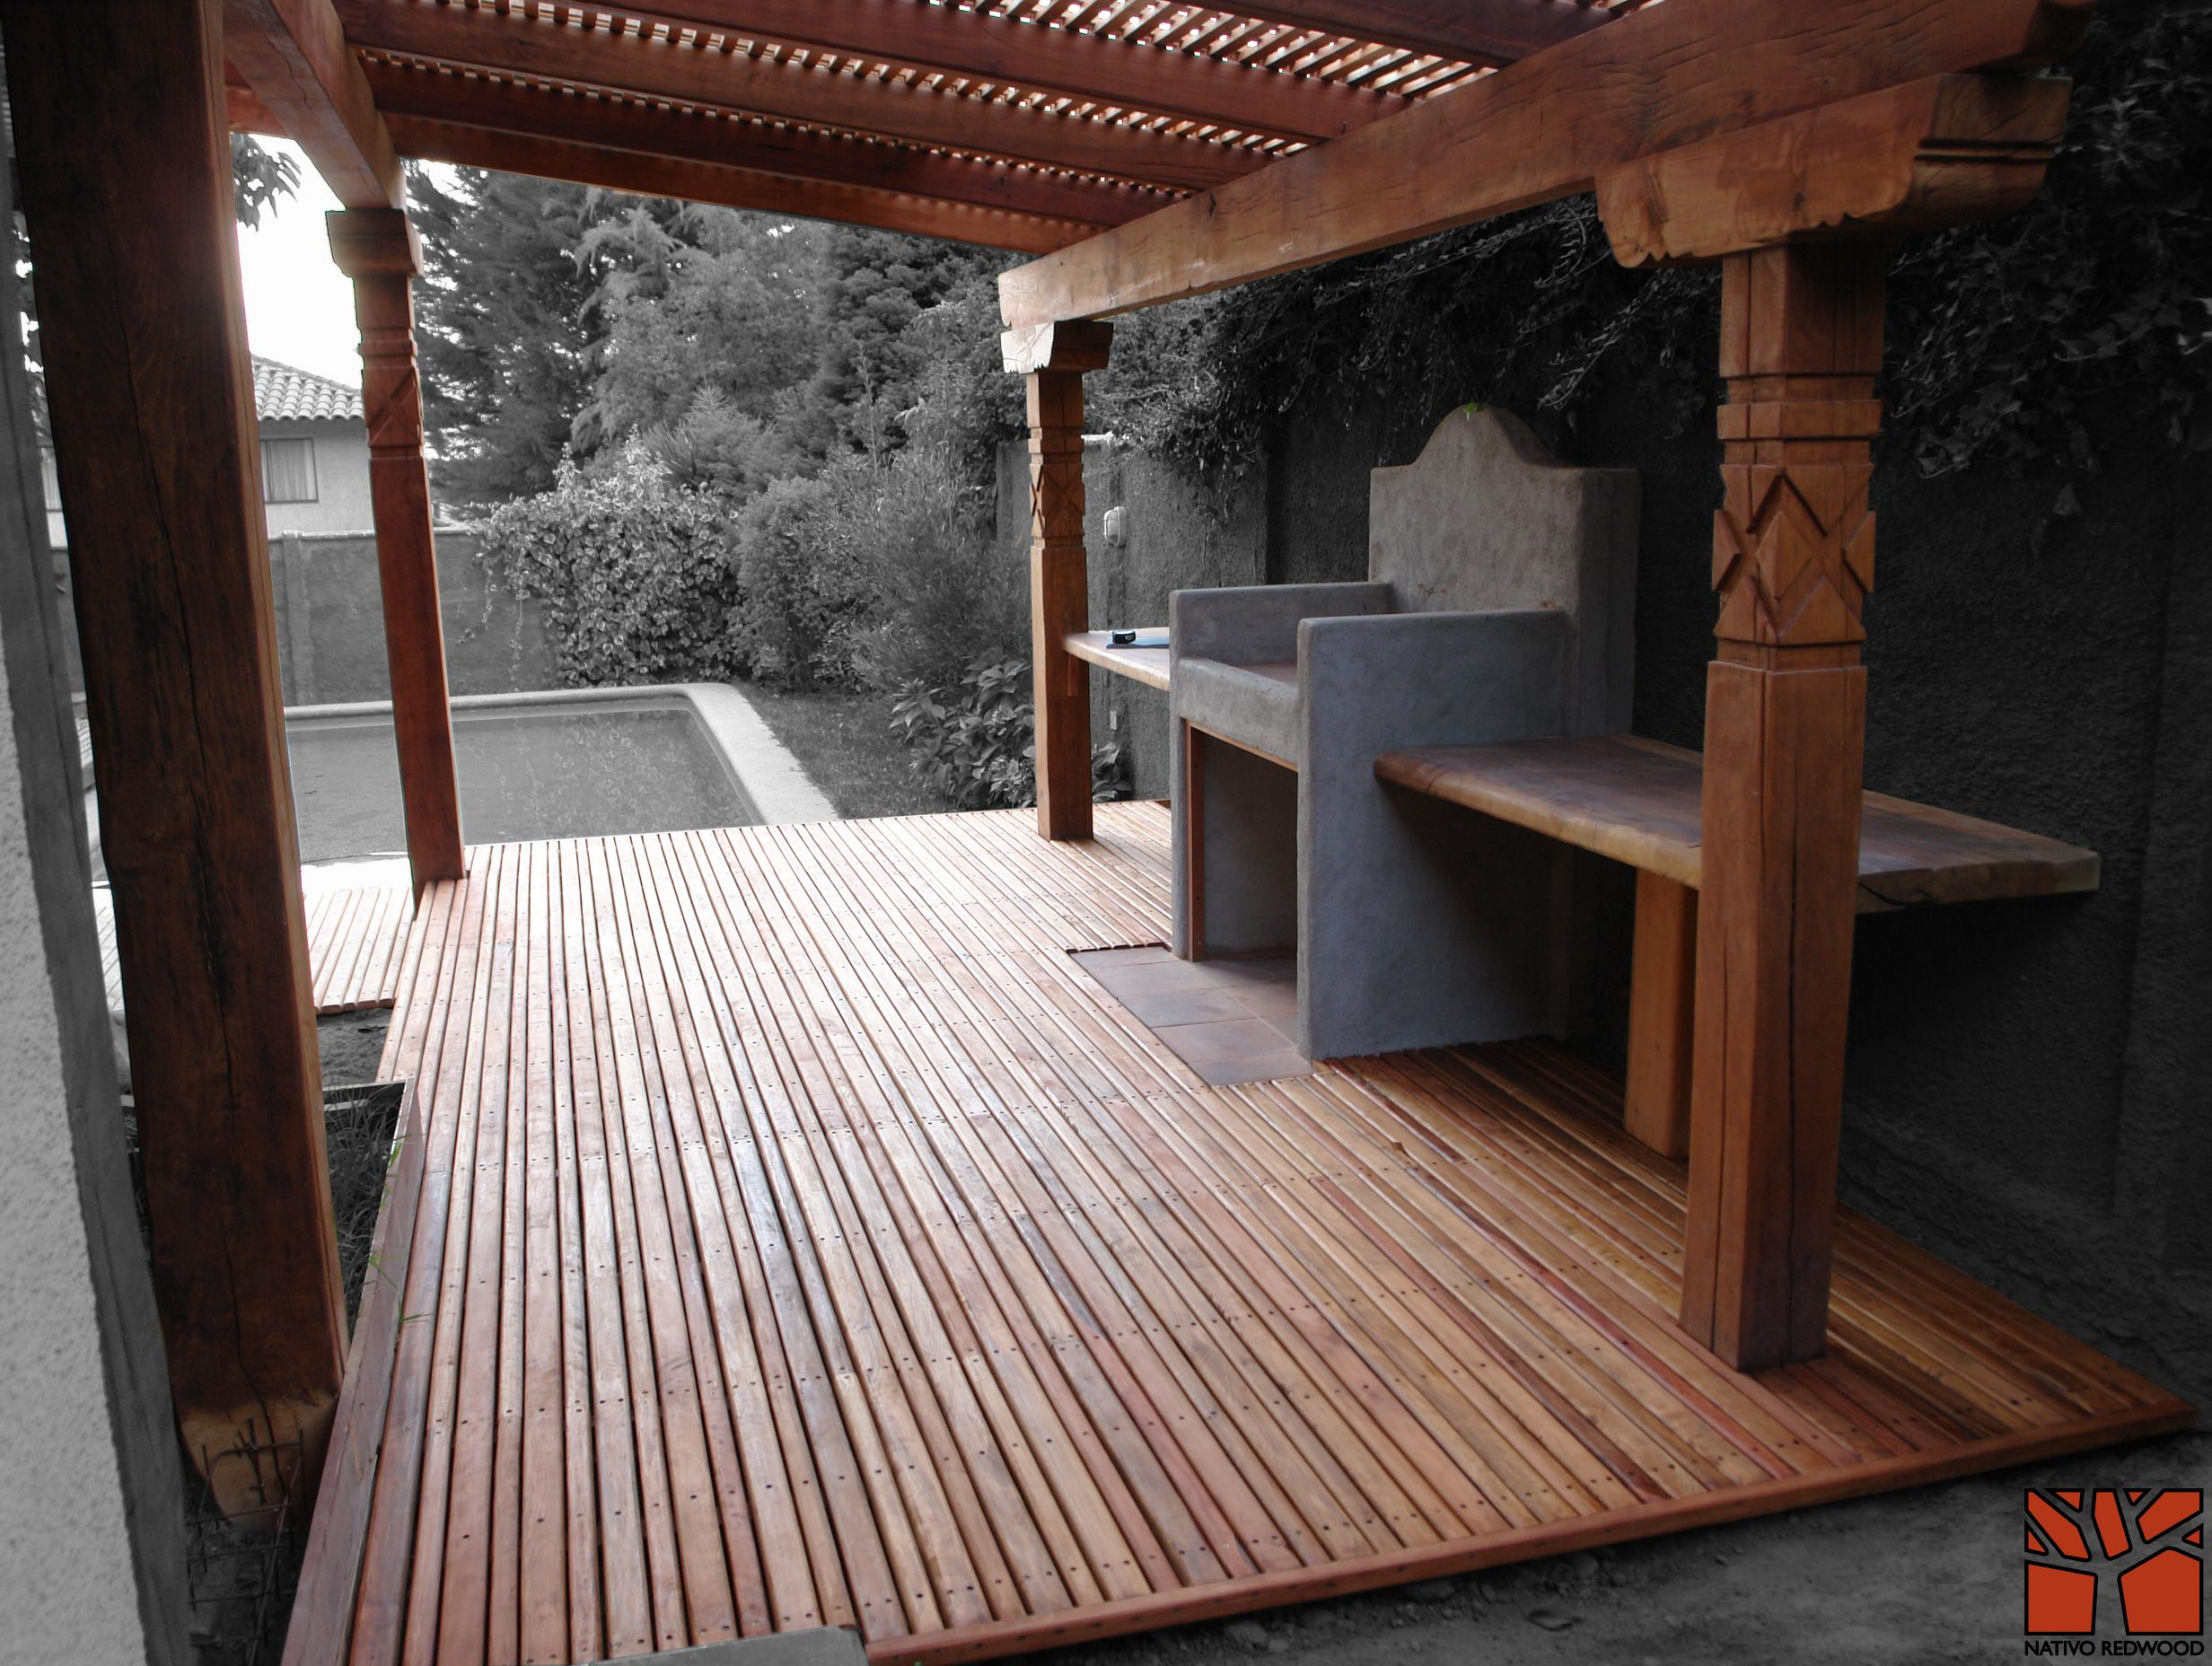 Nativo redwood terraza en casa en condominio quilin - Estructuras metalicas para terrazas ...